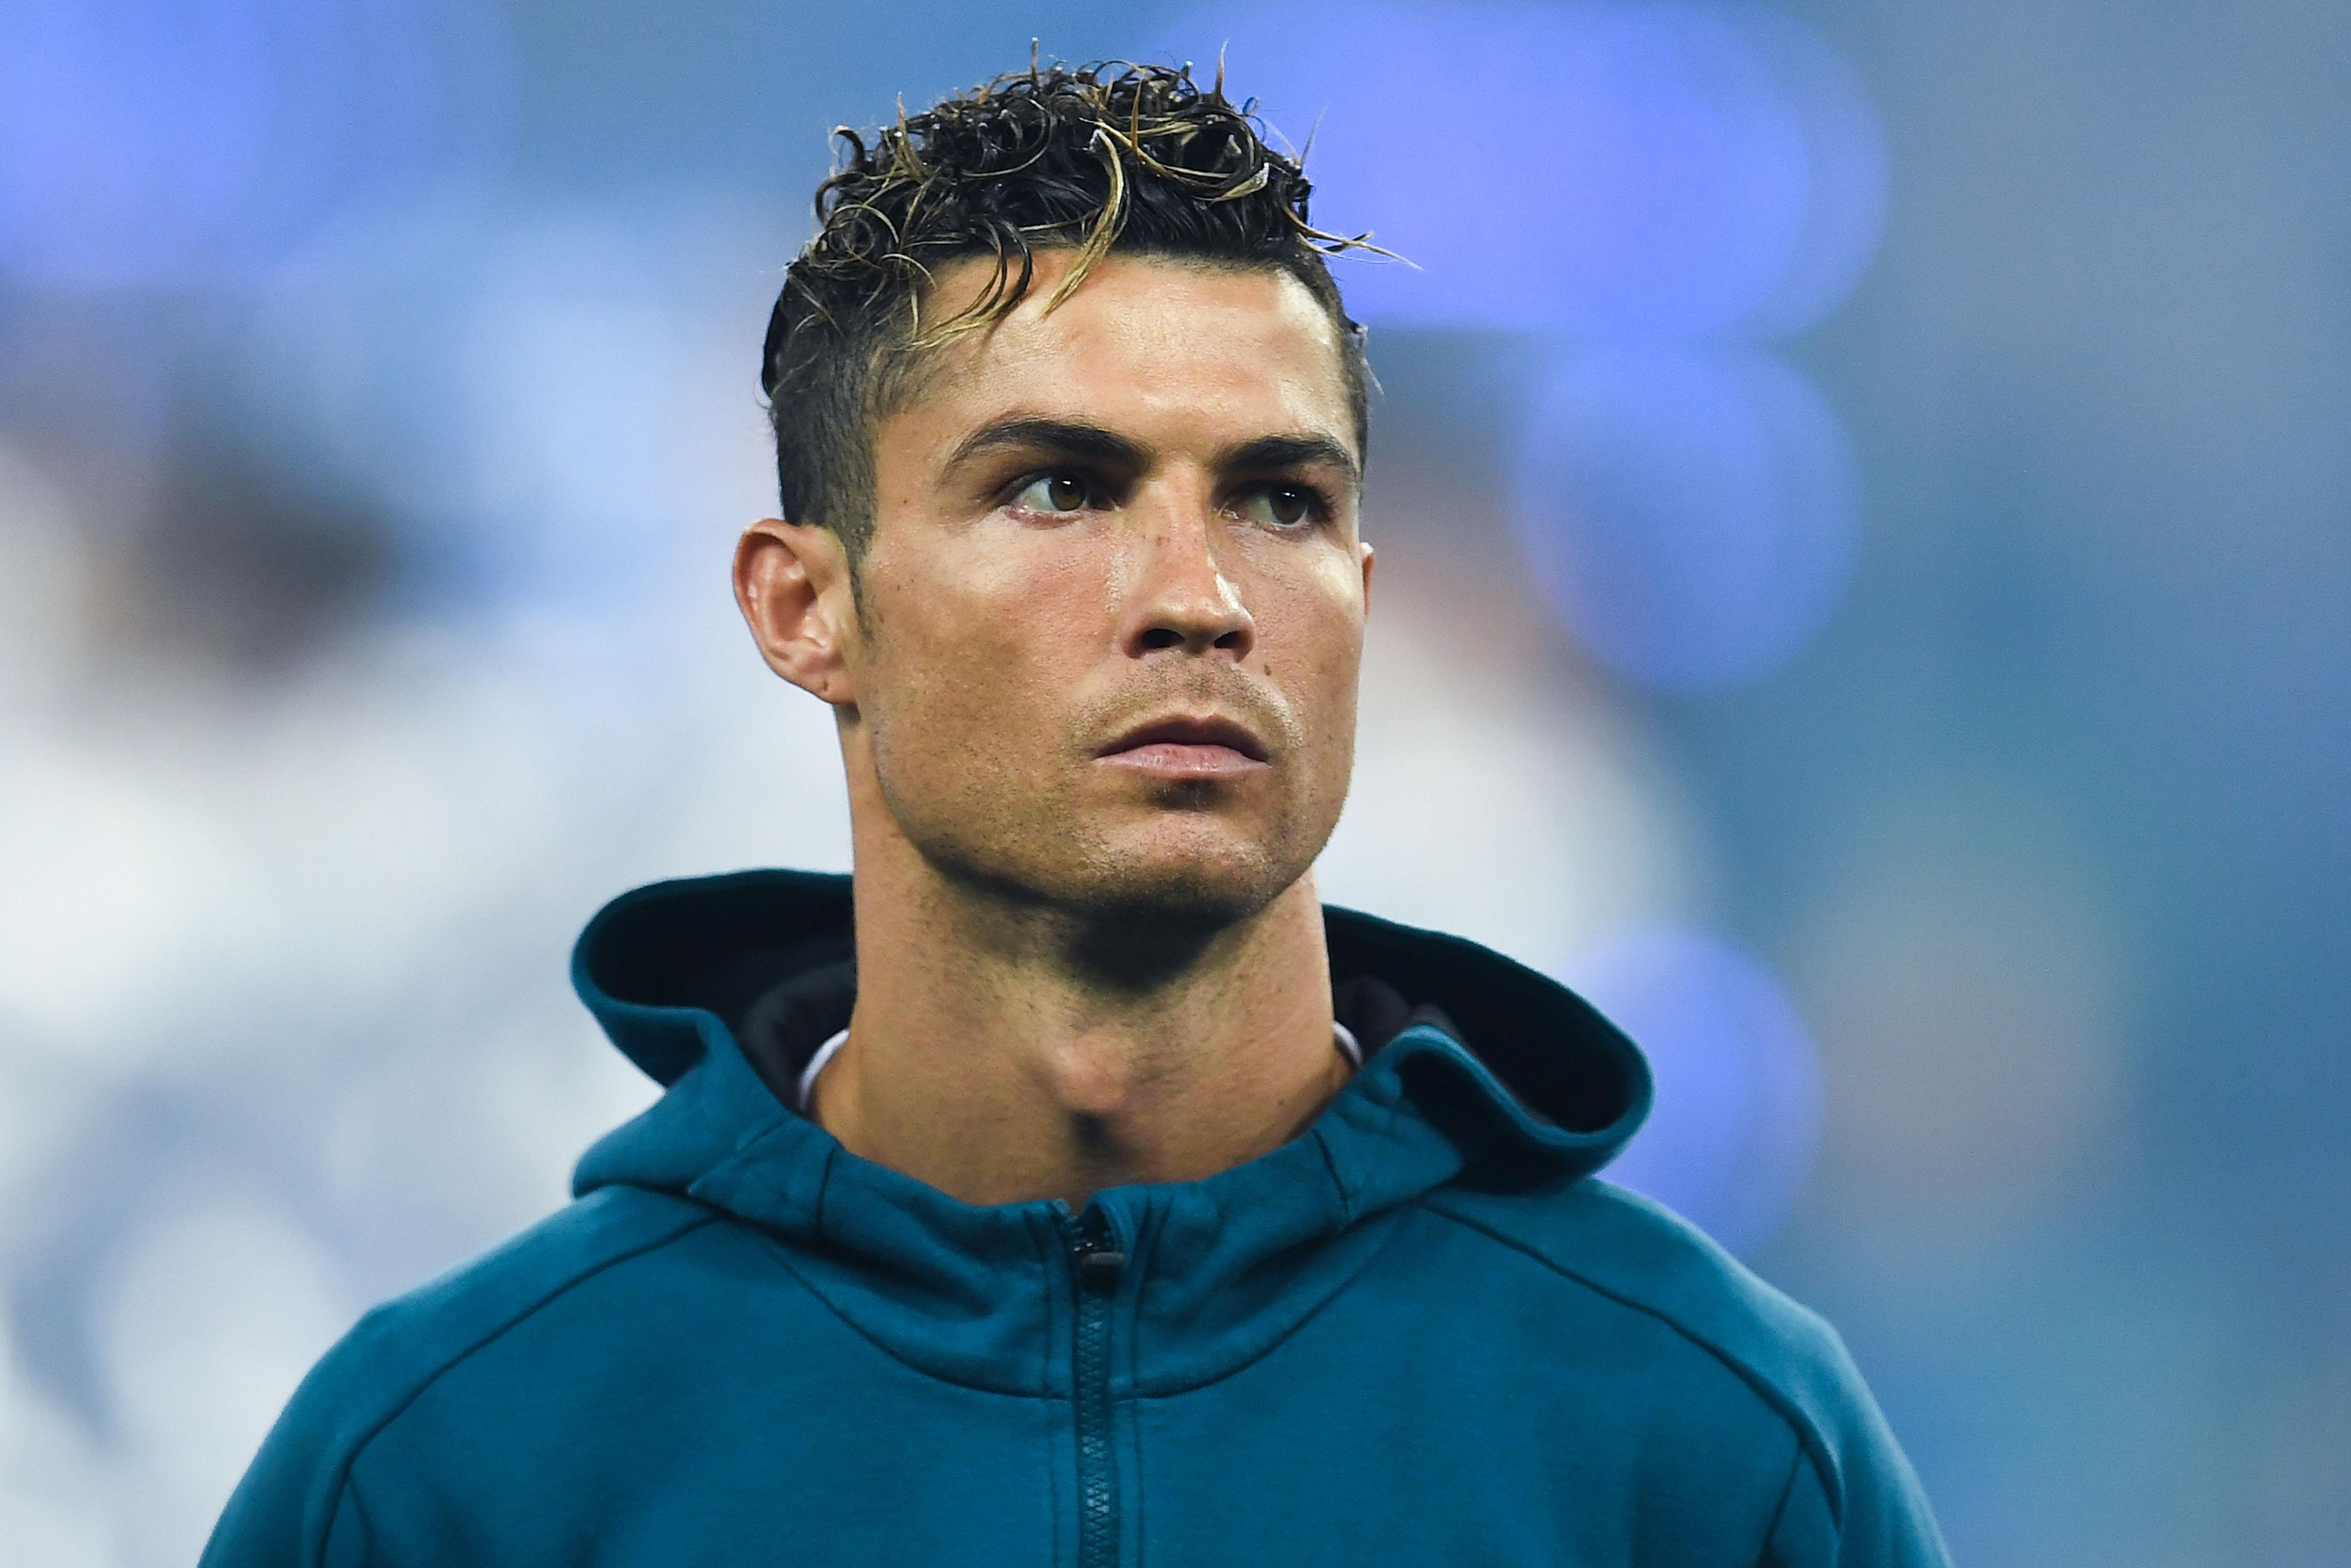 Cristiano Ronaldo faces imprisonment for non-payment of taxes 31.07.2017 92